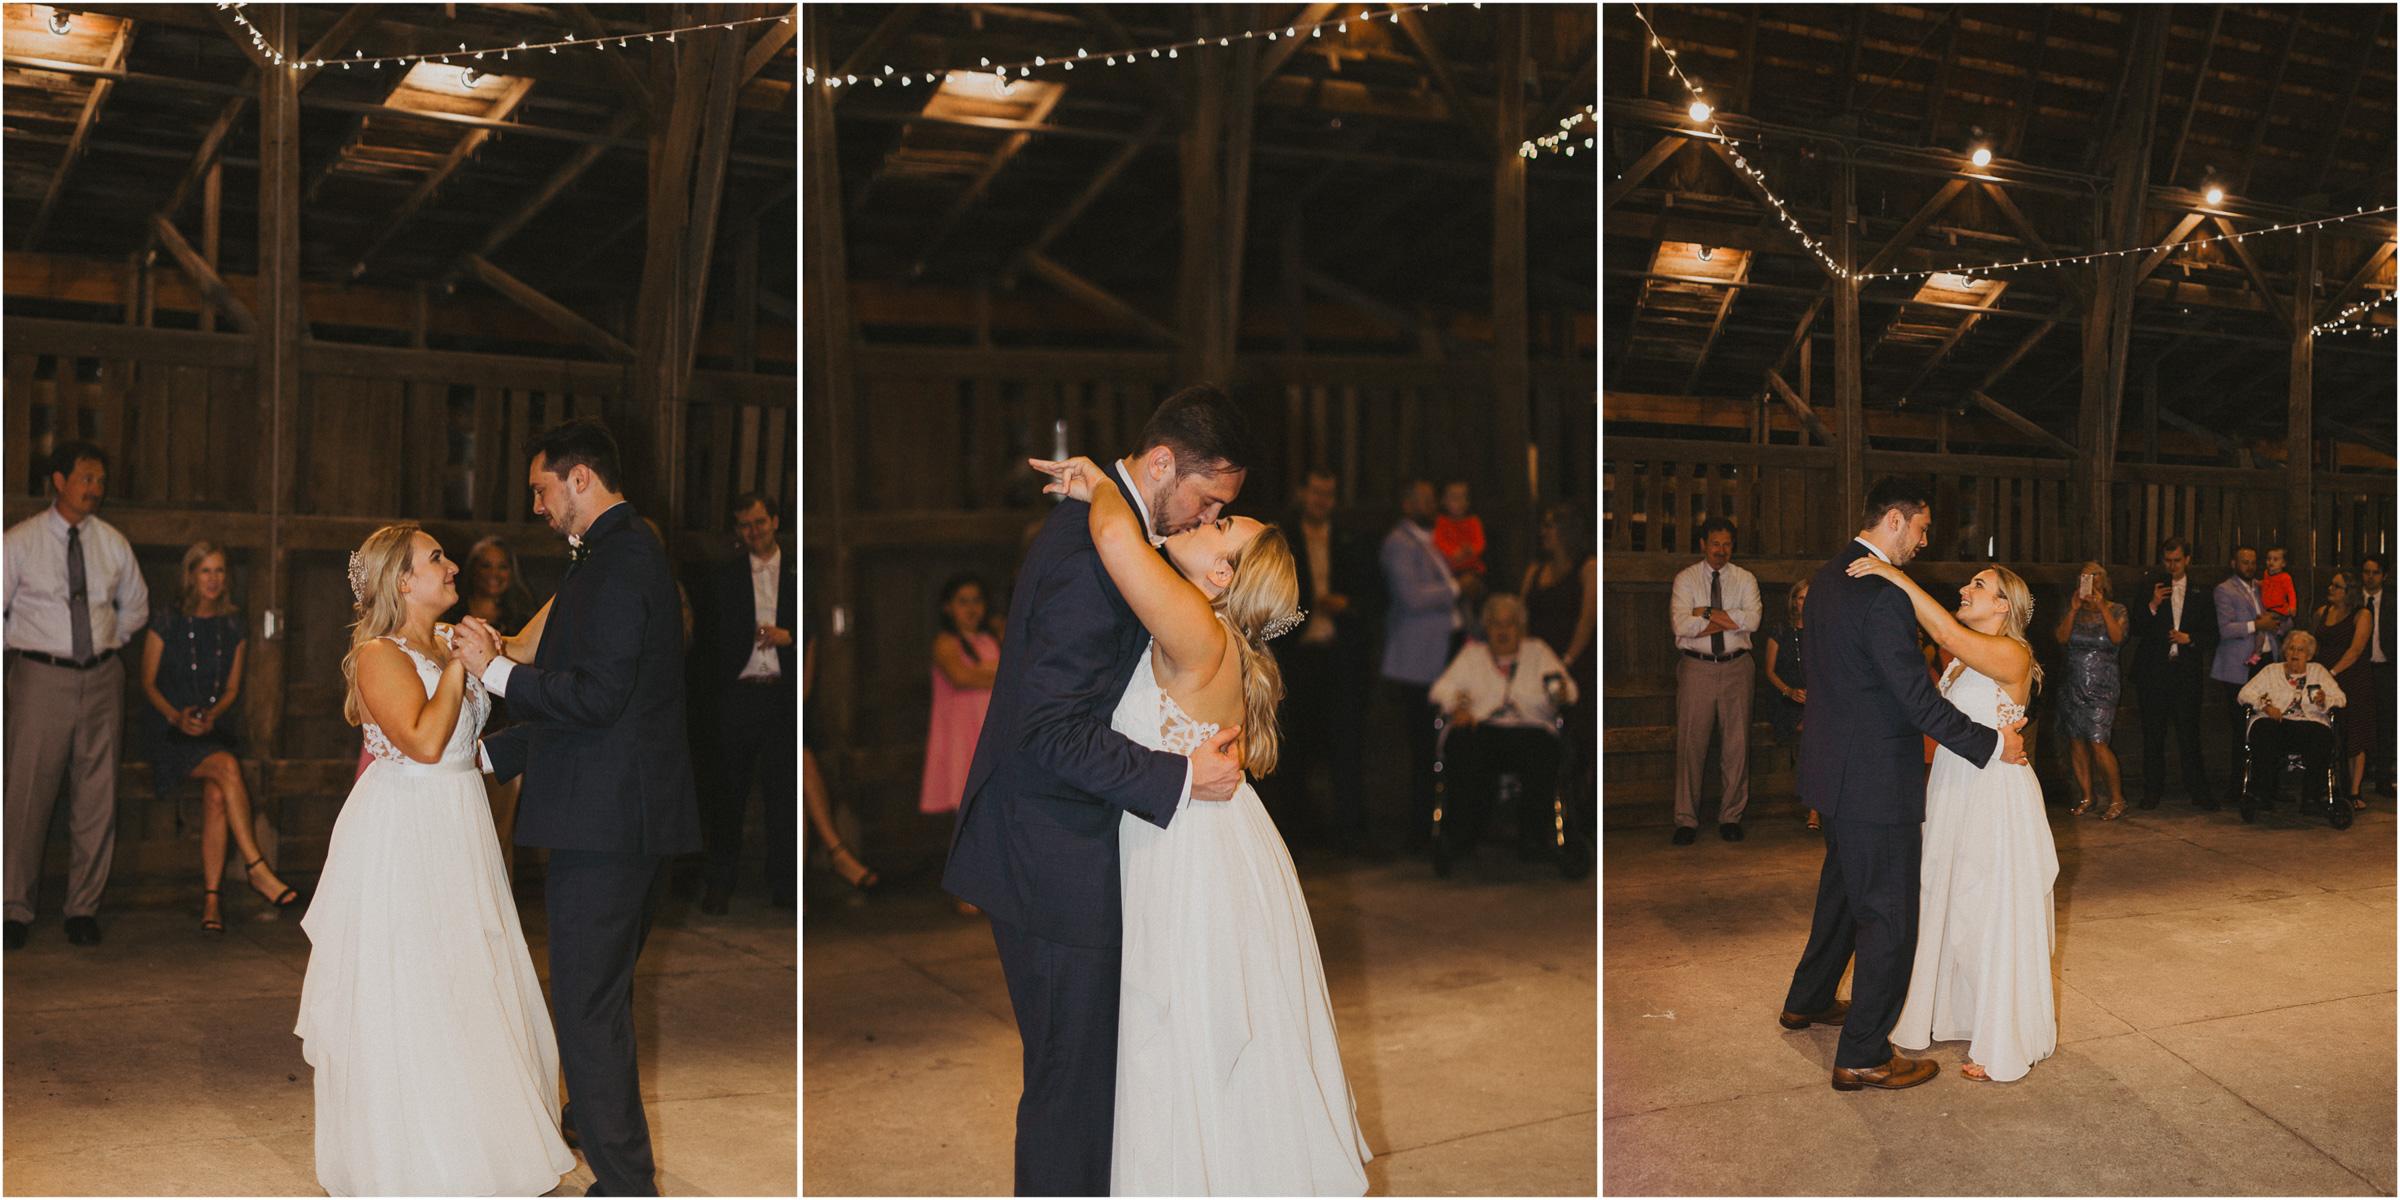 alyssa barletter photography nelson wedding nebraska city lied lodge morton barn spring wedding photographer-58.jpg